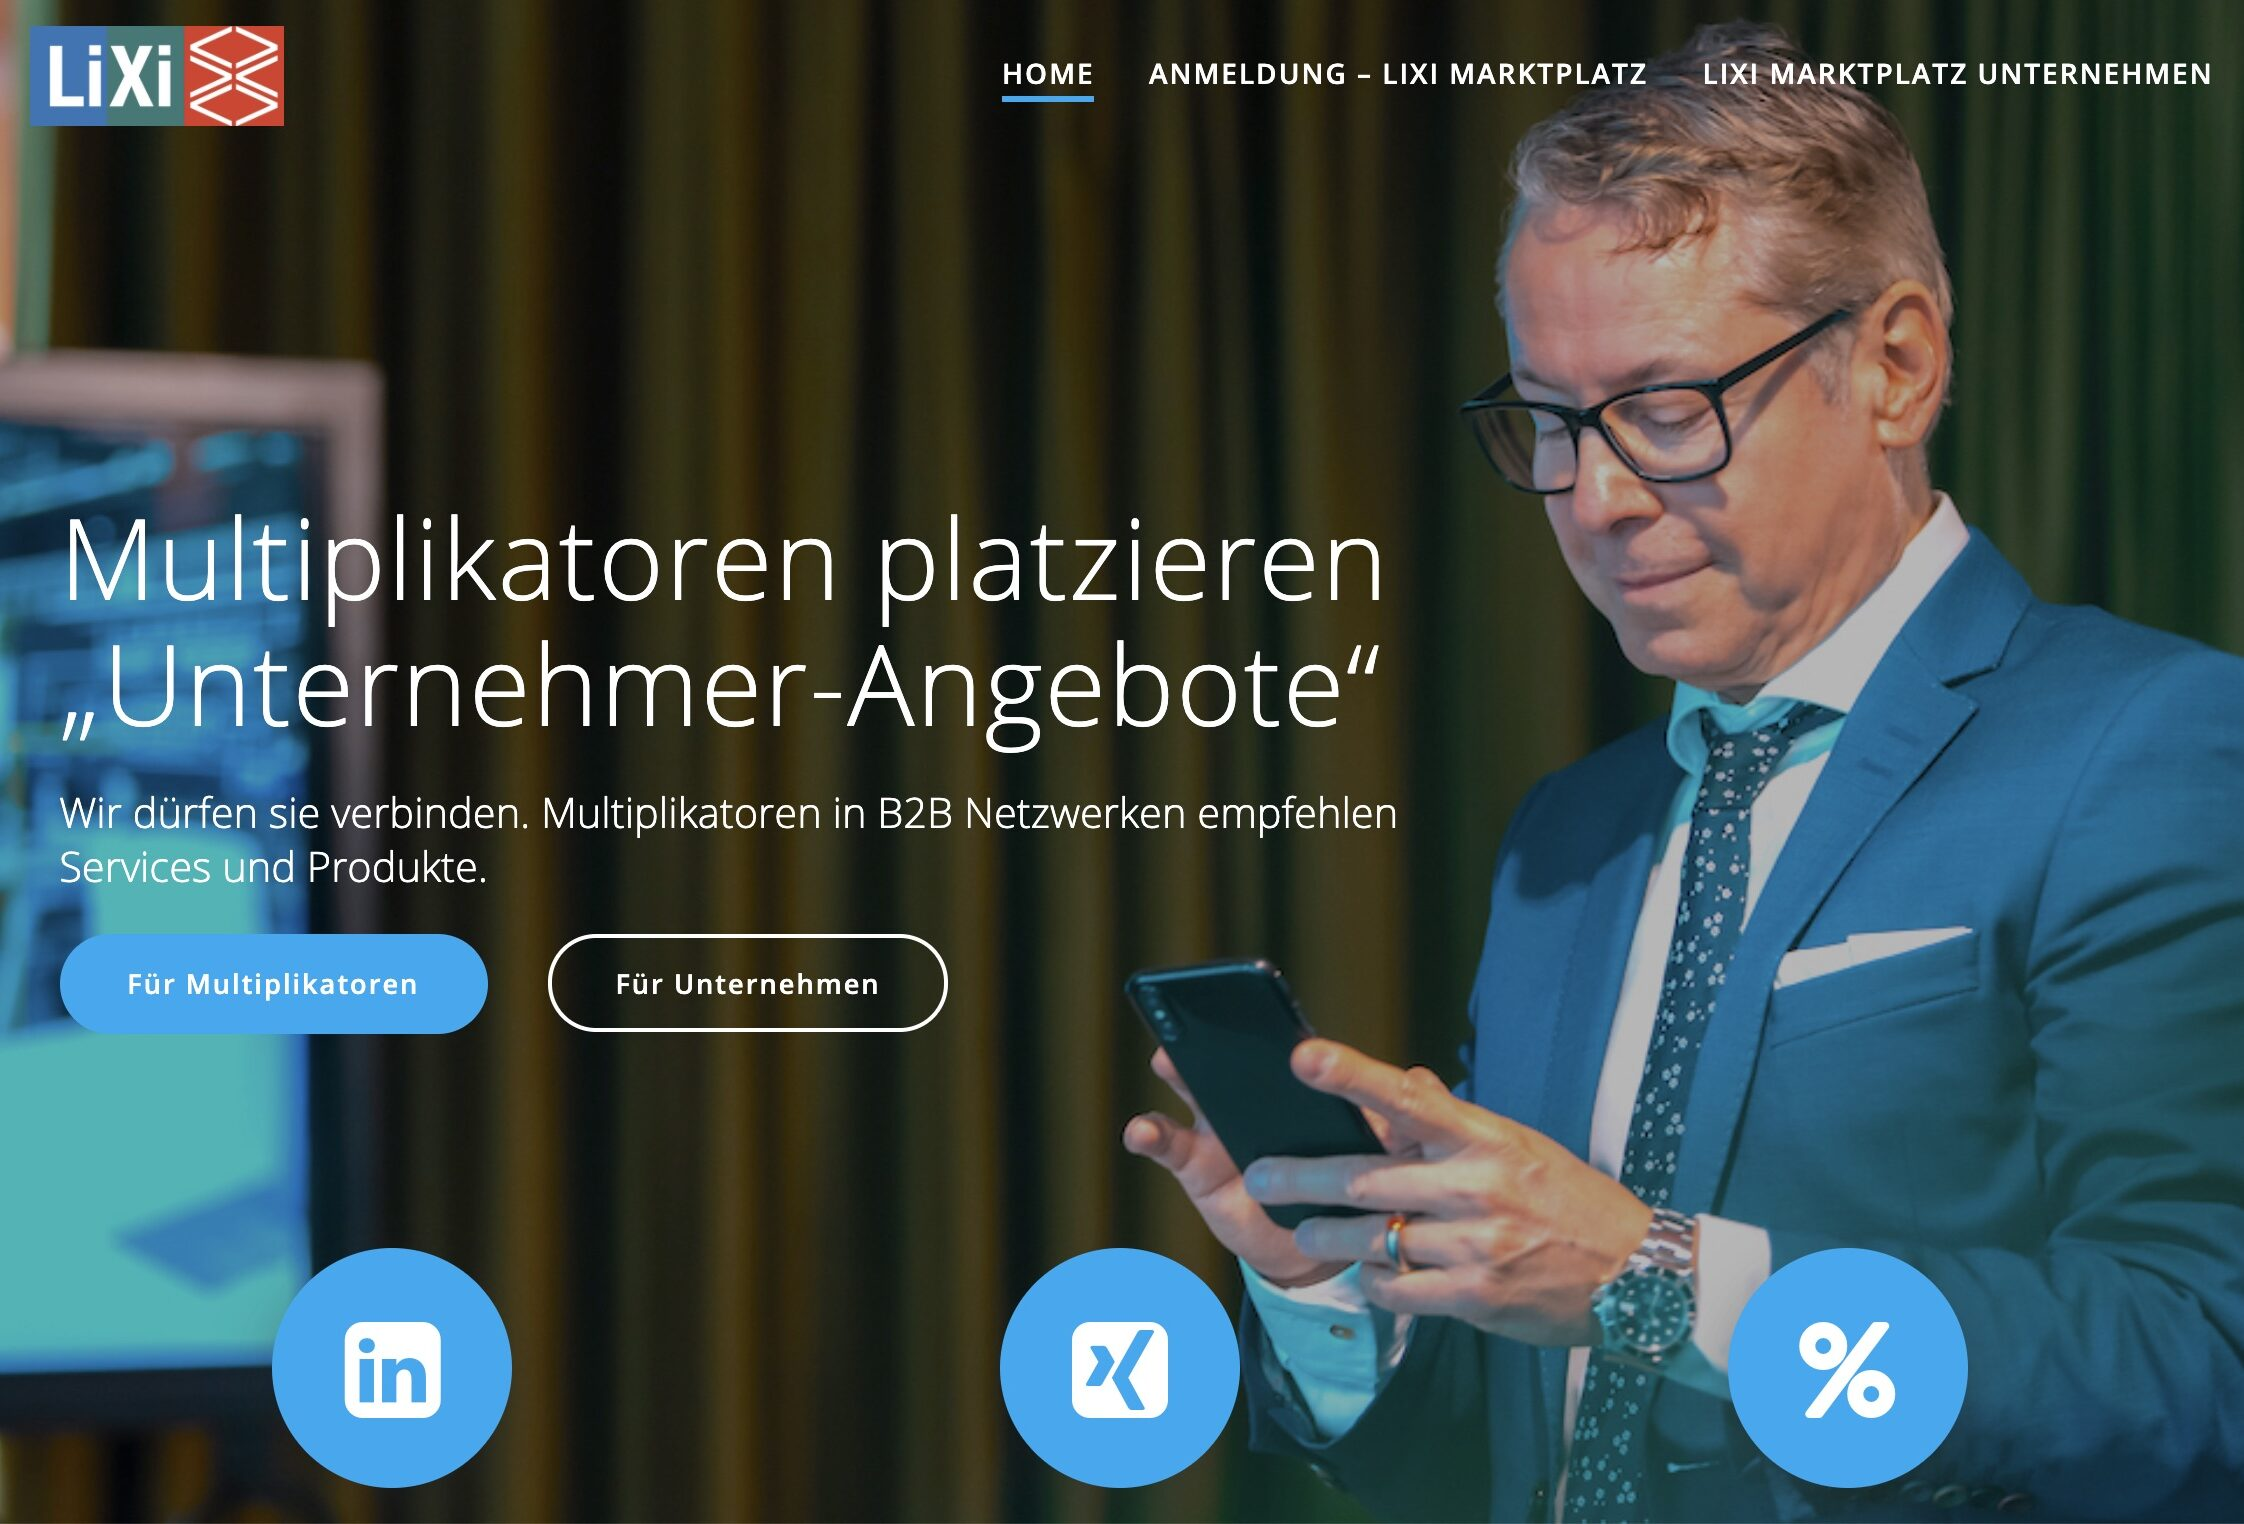 2020 LiXi Gestaltung Internetseite Blog Shop Betreuung Programmierung Concierge Gerry Deeseo